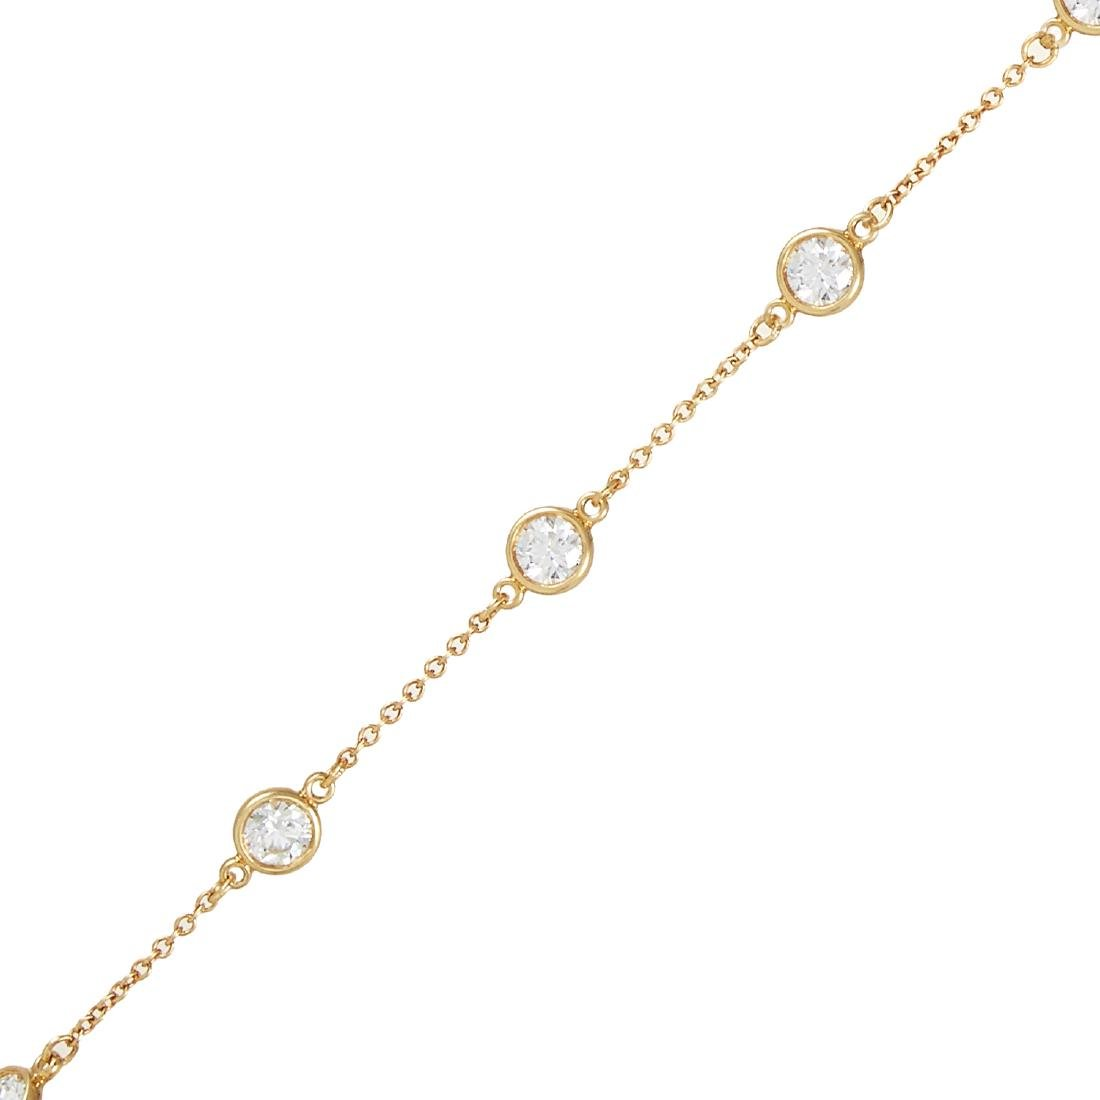 A 1.26 CARAT DIAMOND BRACELET, ELSA PERETTI FOR TIFFANY - 2